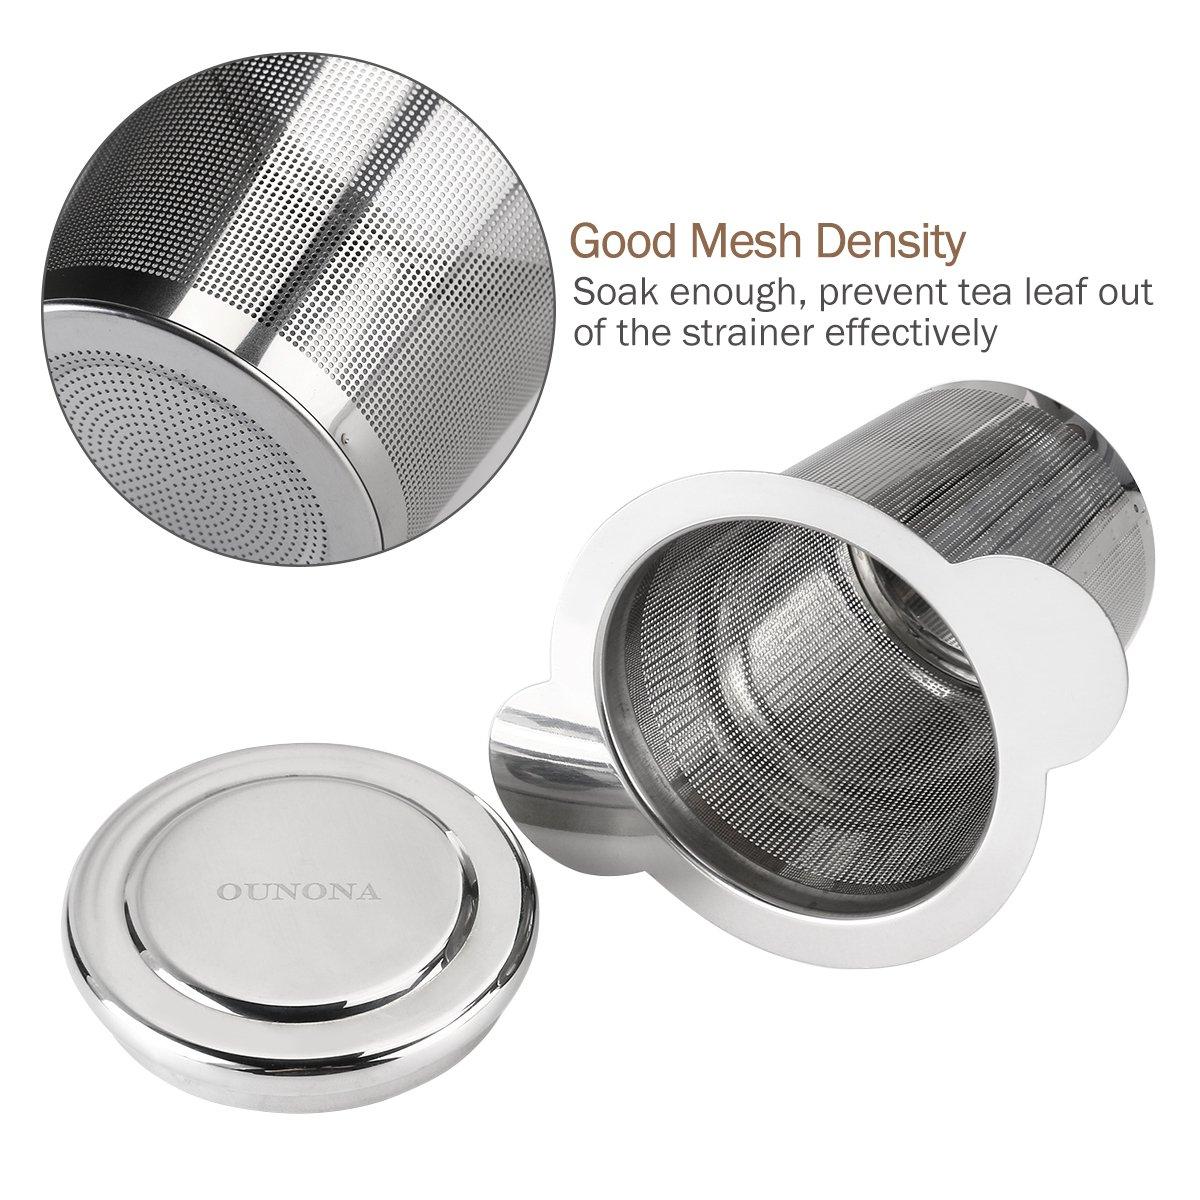 OUNONA 304 Stainless Steel Tea Strainer Mesh Tea Infuser with Lid for Loose Leaf Grain Tea Cups